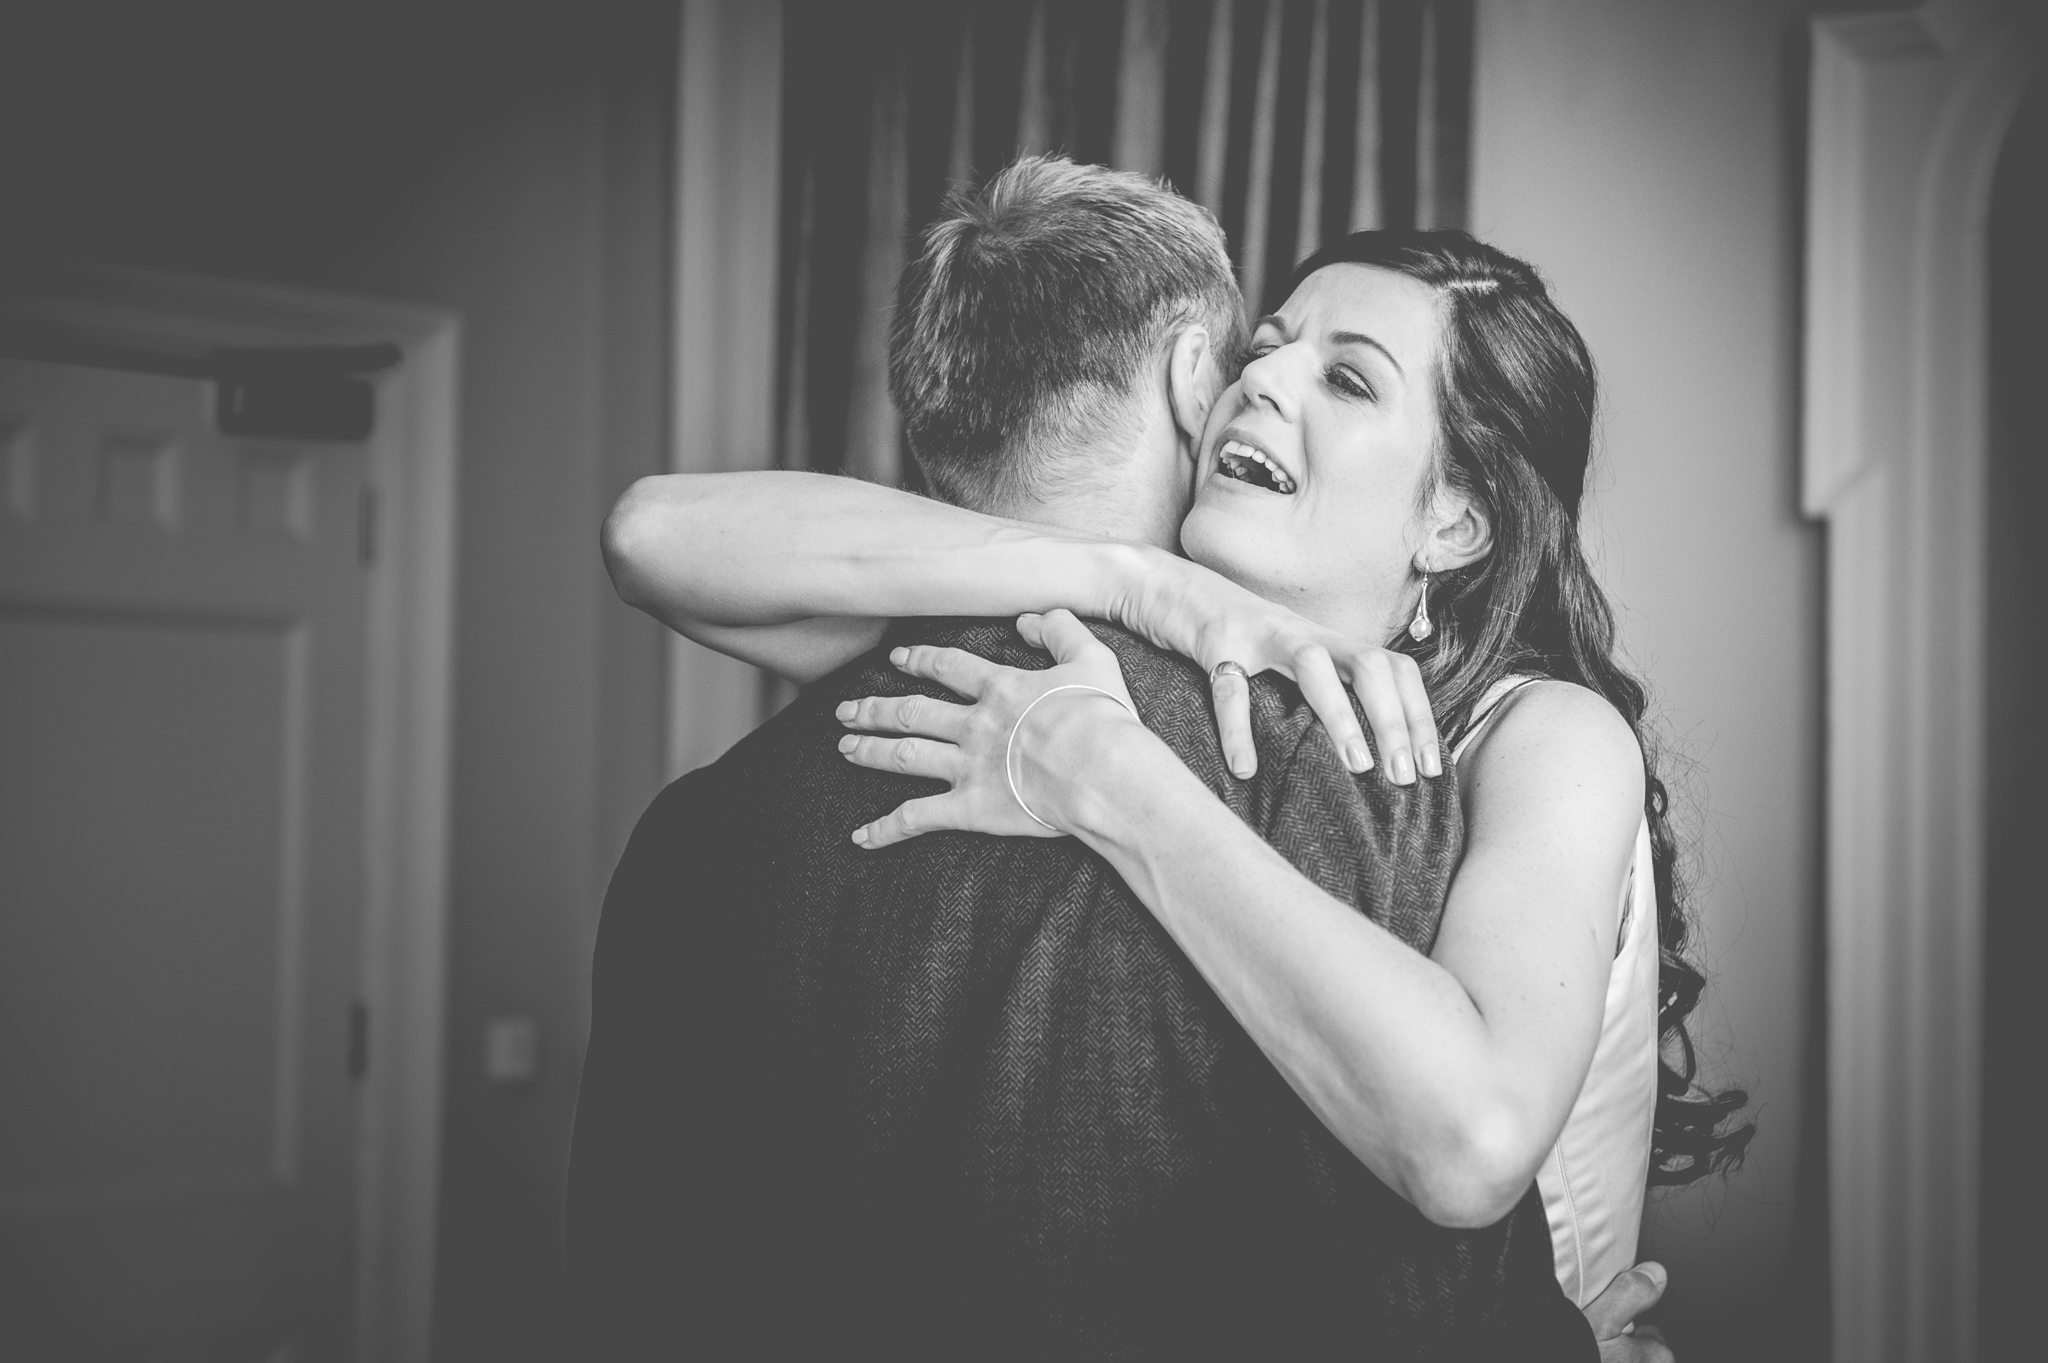 Bride embraces her groom